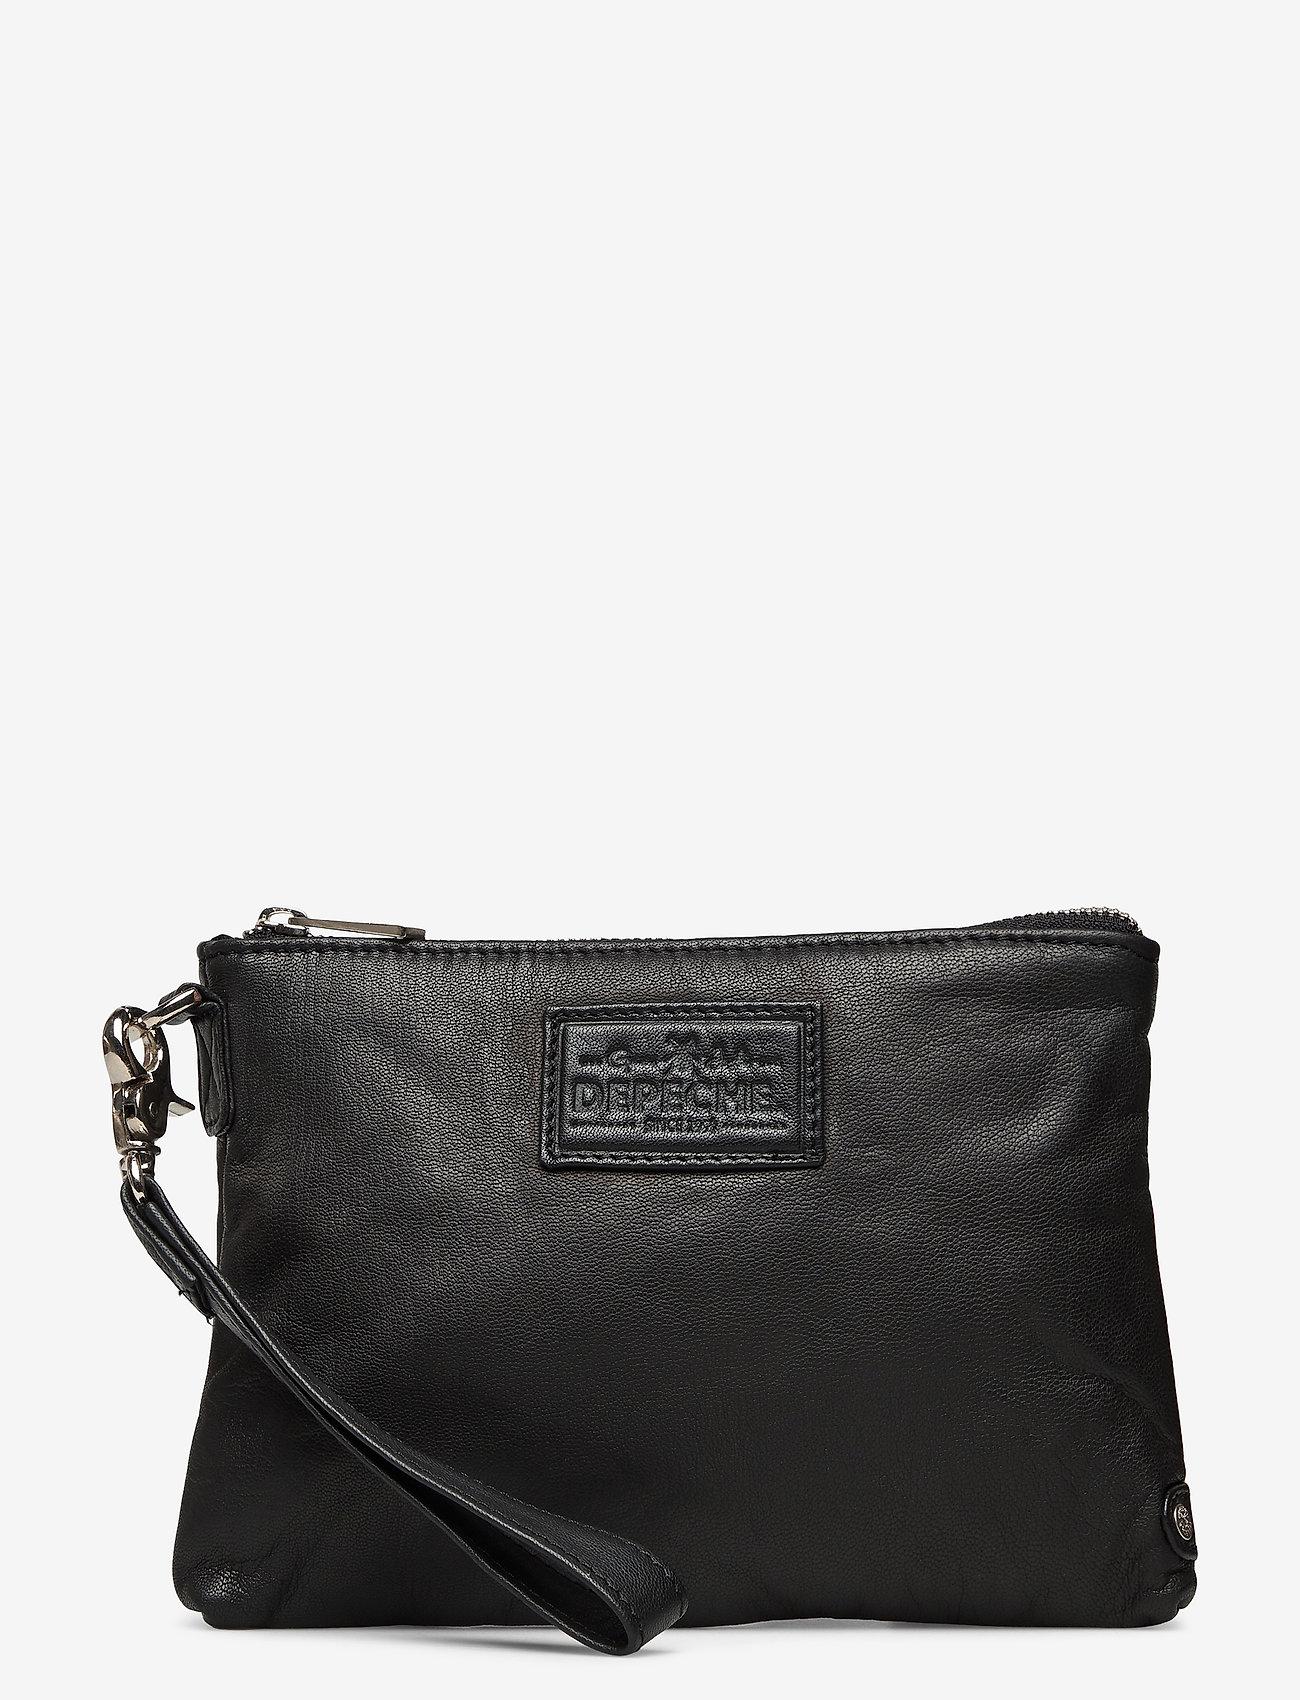 DEPECHE - Cosmetic bag - clutches - 099 black (nero) - 0